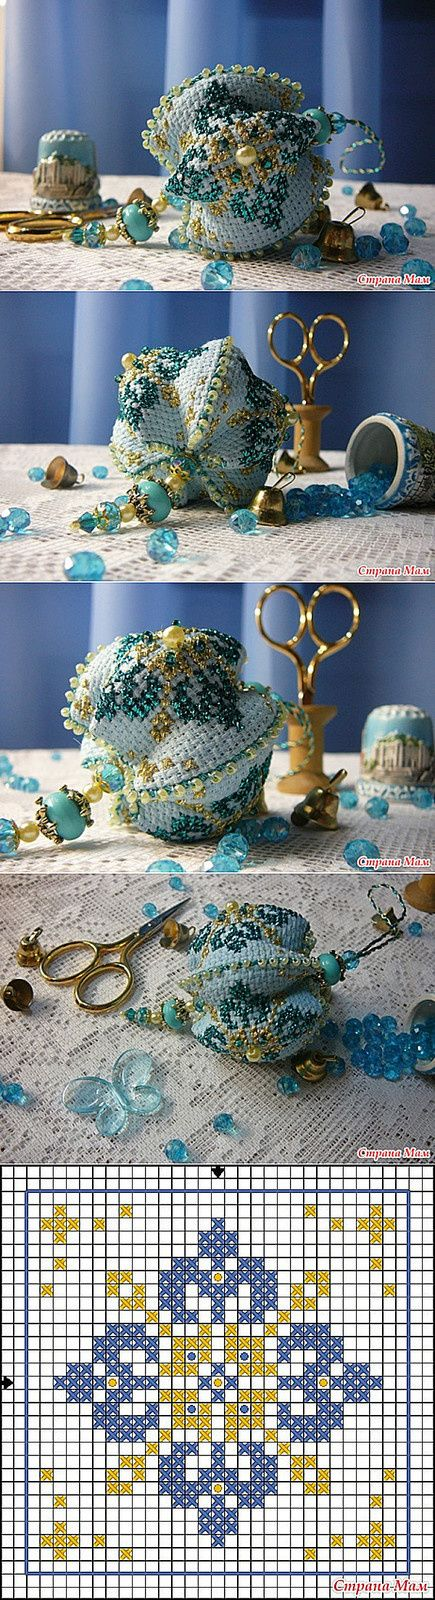 épinglé par ❃❀CM❁✿Joli biscornu perlé More